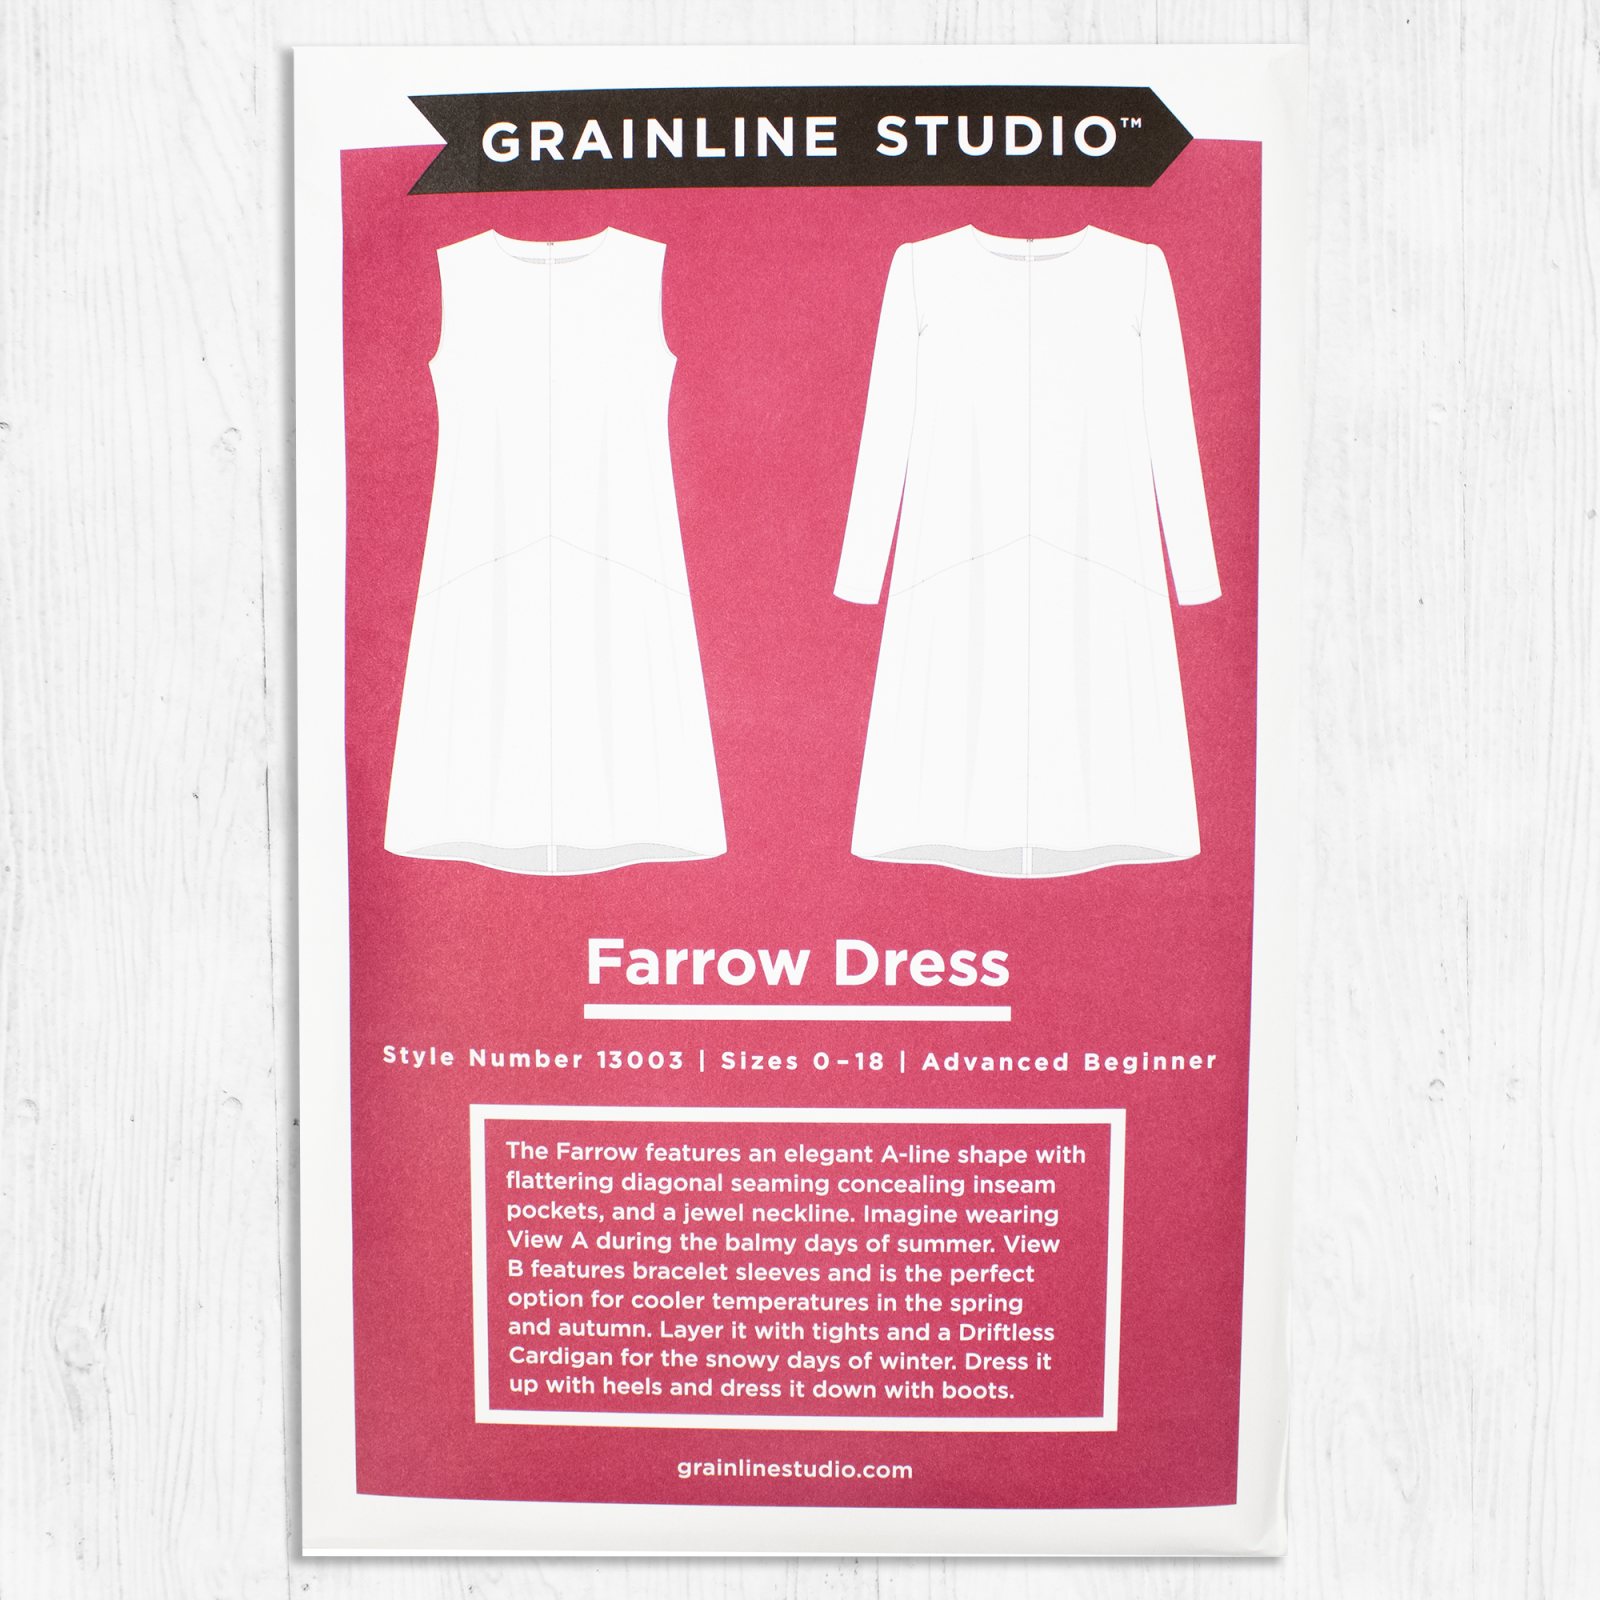 Grainline Studios - Farrow Dress